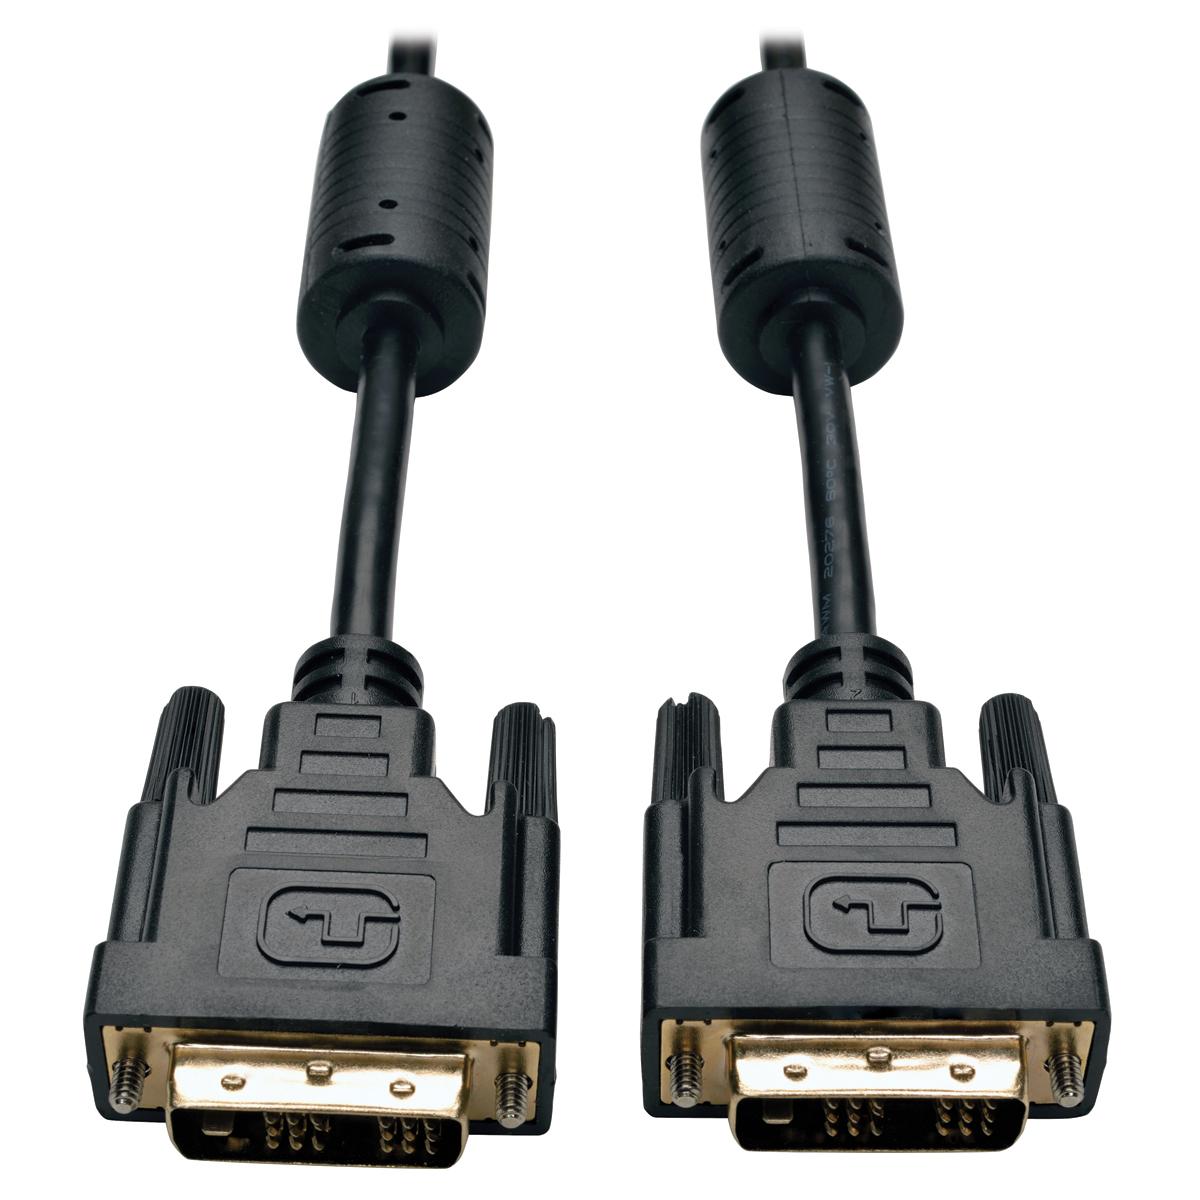 Tripp Lite DVI Single Link Cable, Digital TMDS Monitor Cable (DVI-D M/M), 0.91 m (3-ft.)